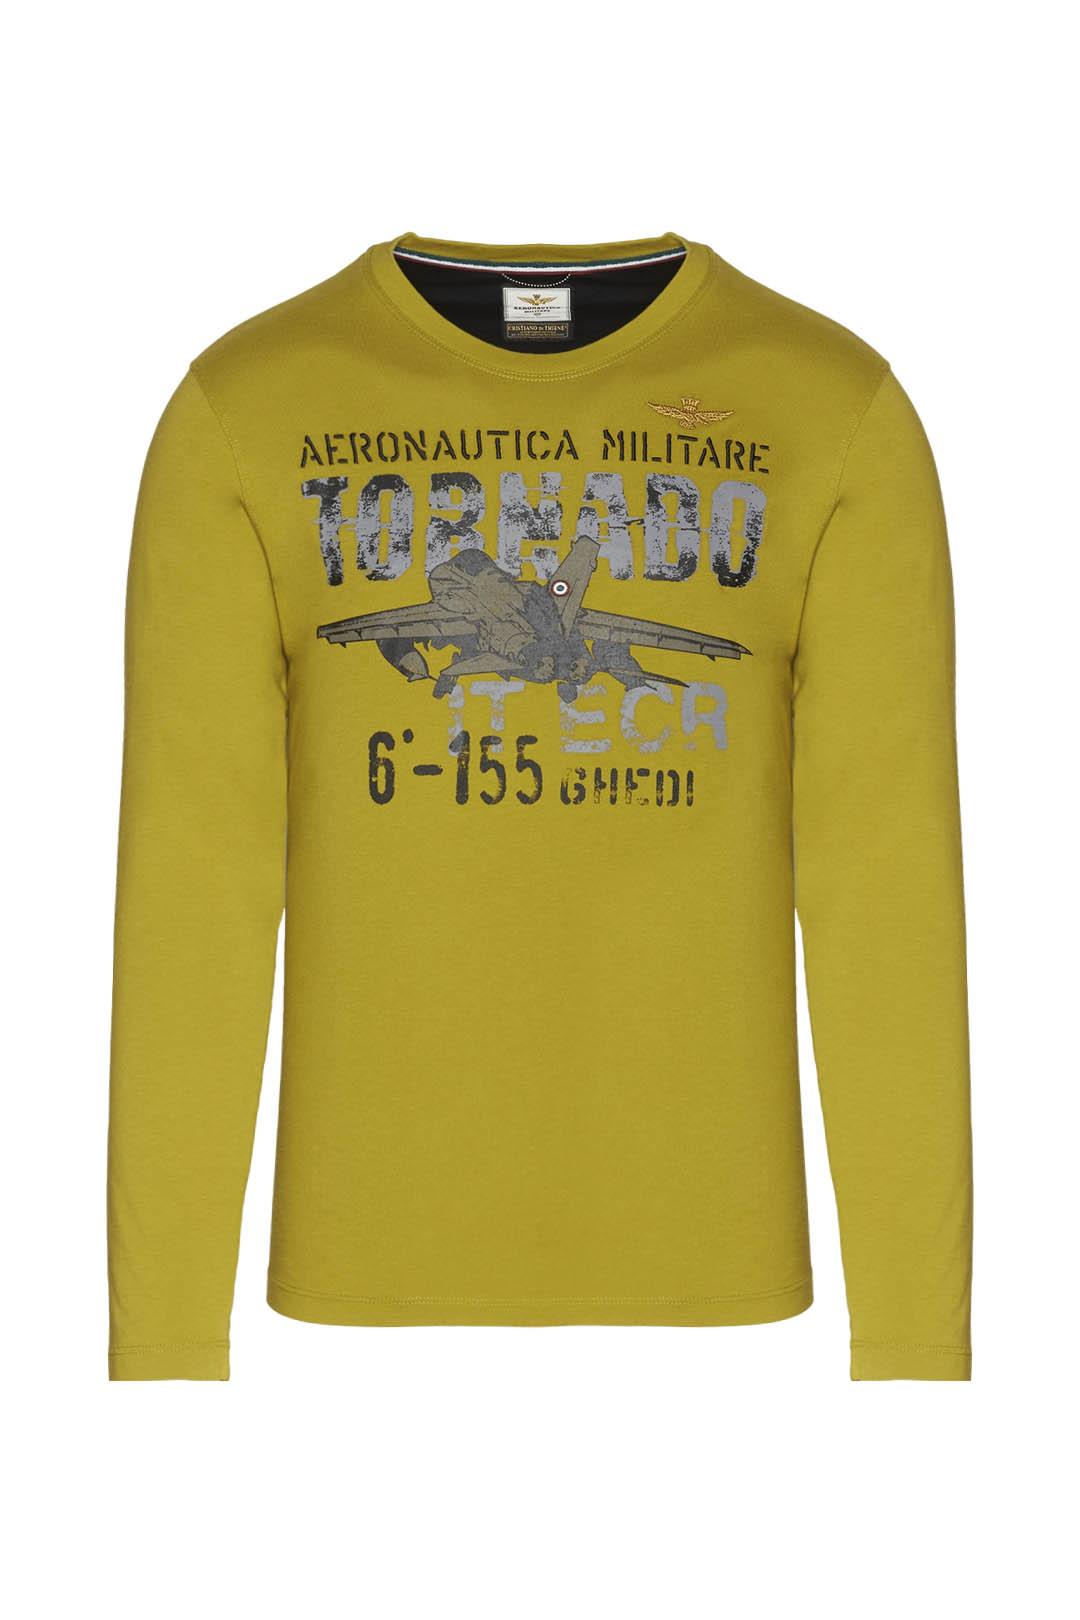 6th Wing Tornado printed t-shirt